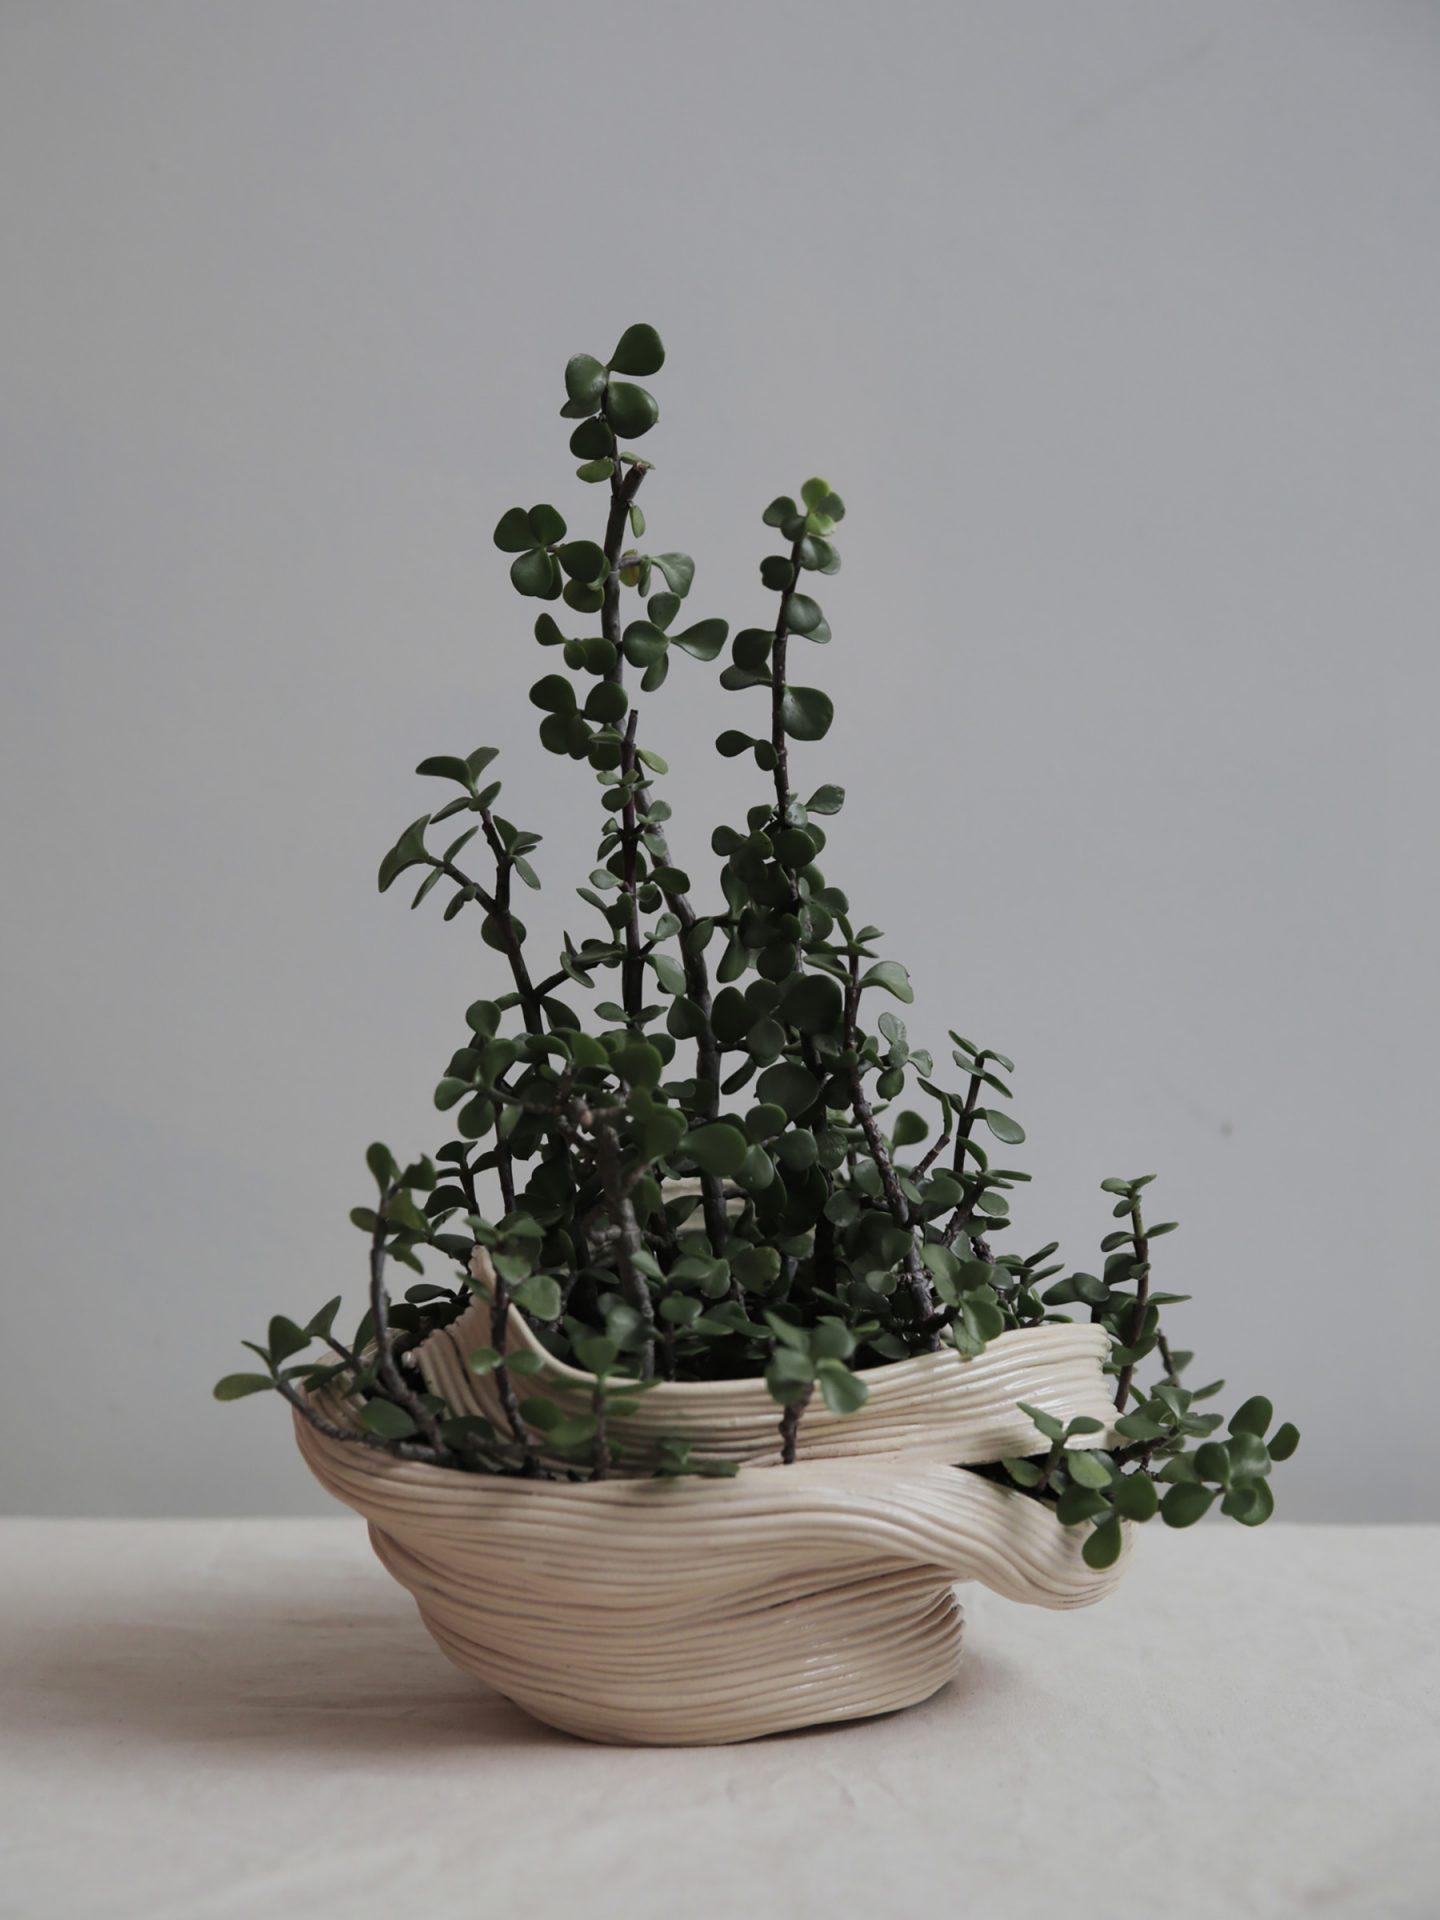 iGNANT-Design-Zhu-Ohmu-Plantsukuroi-03